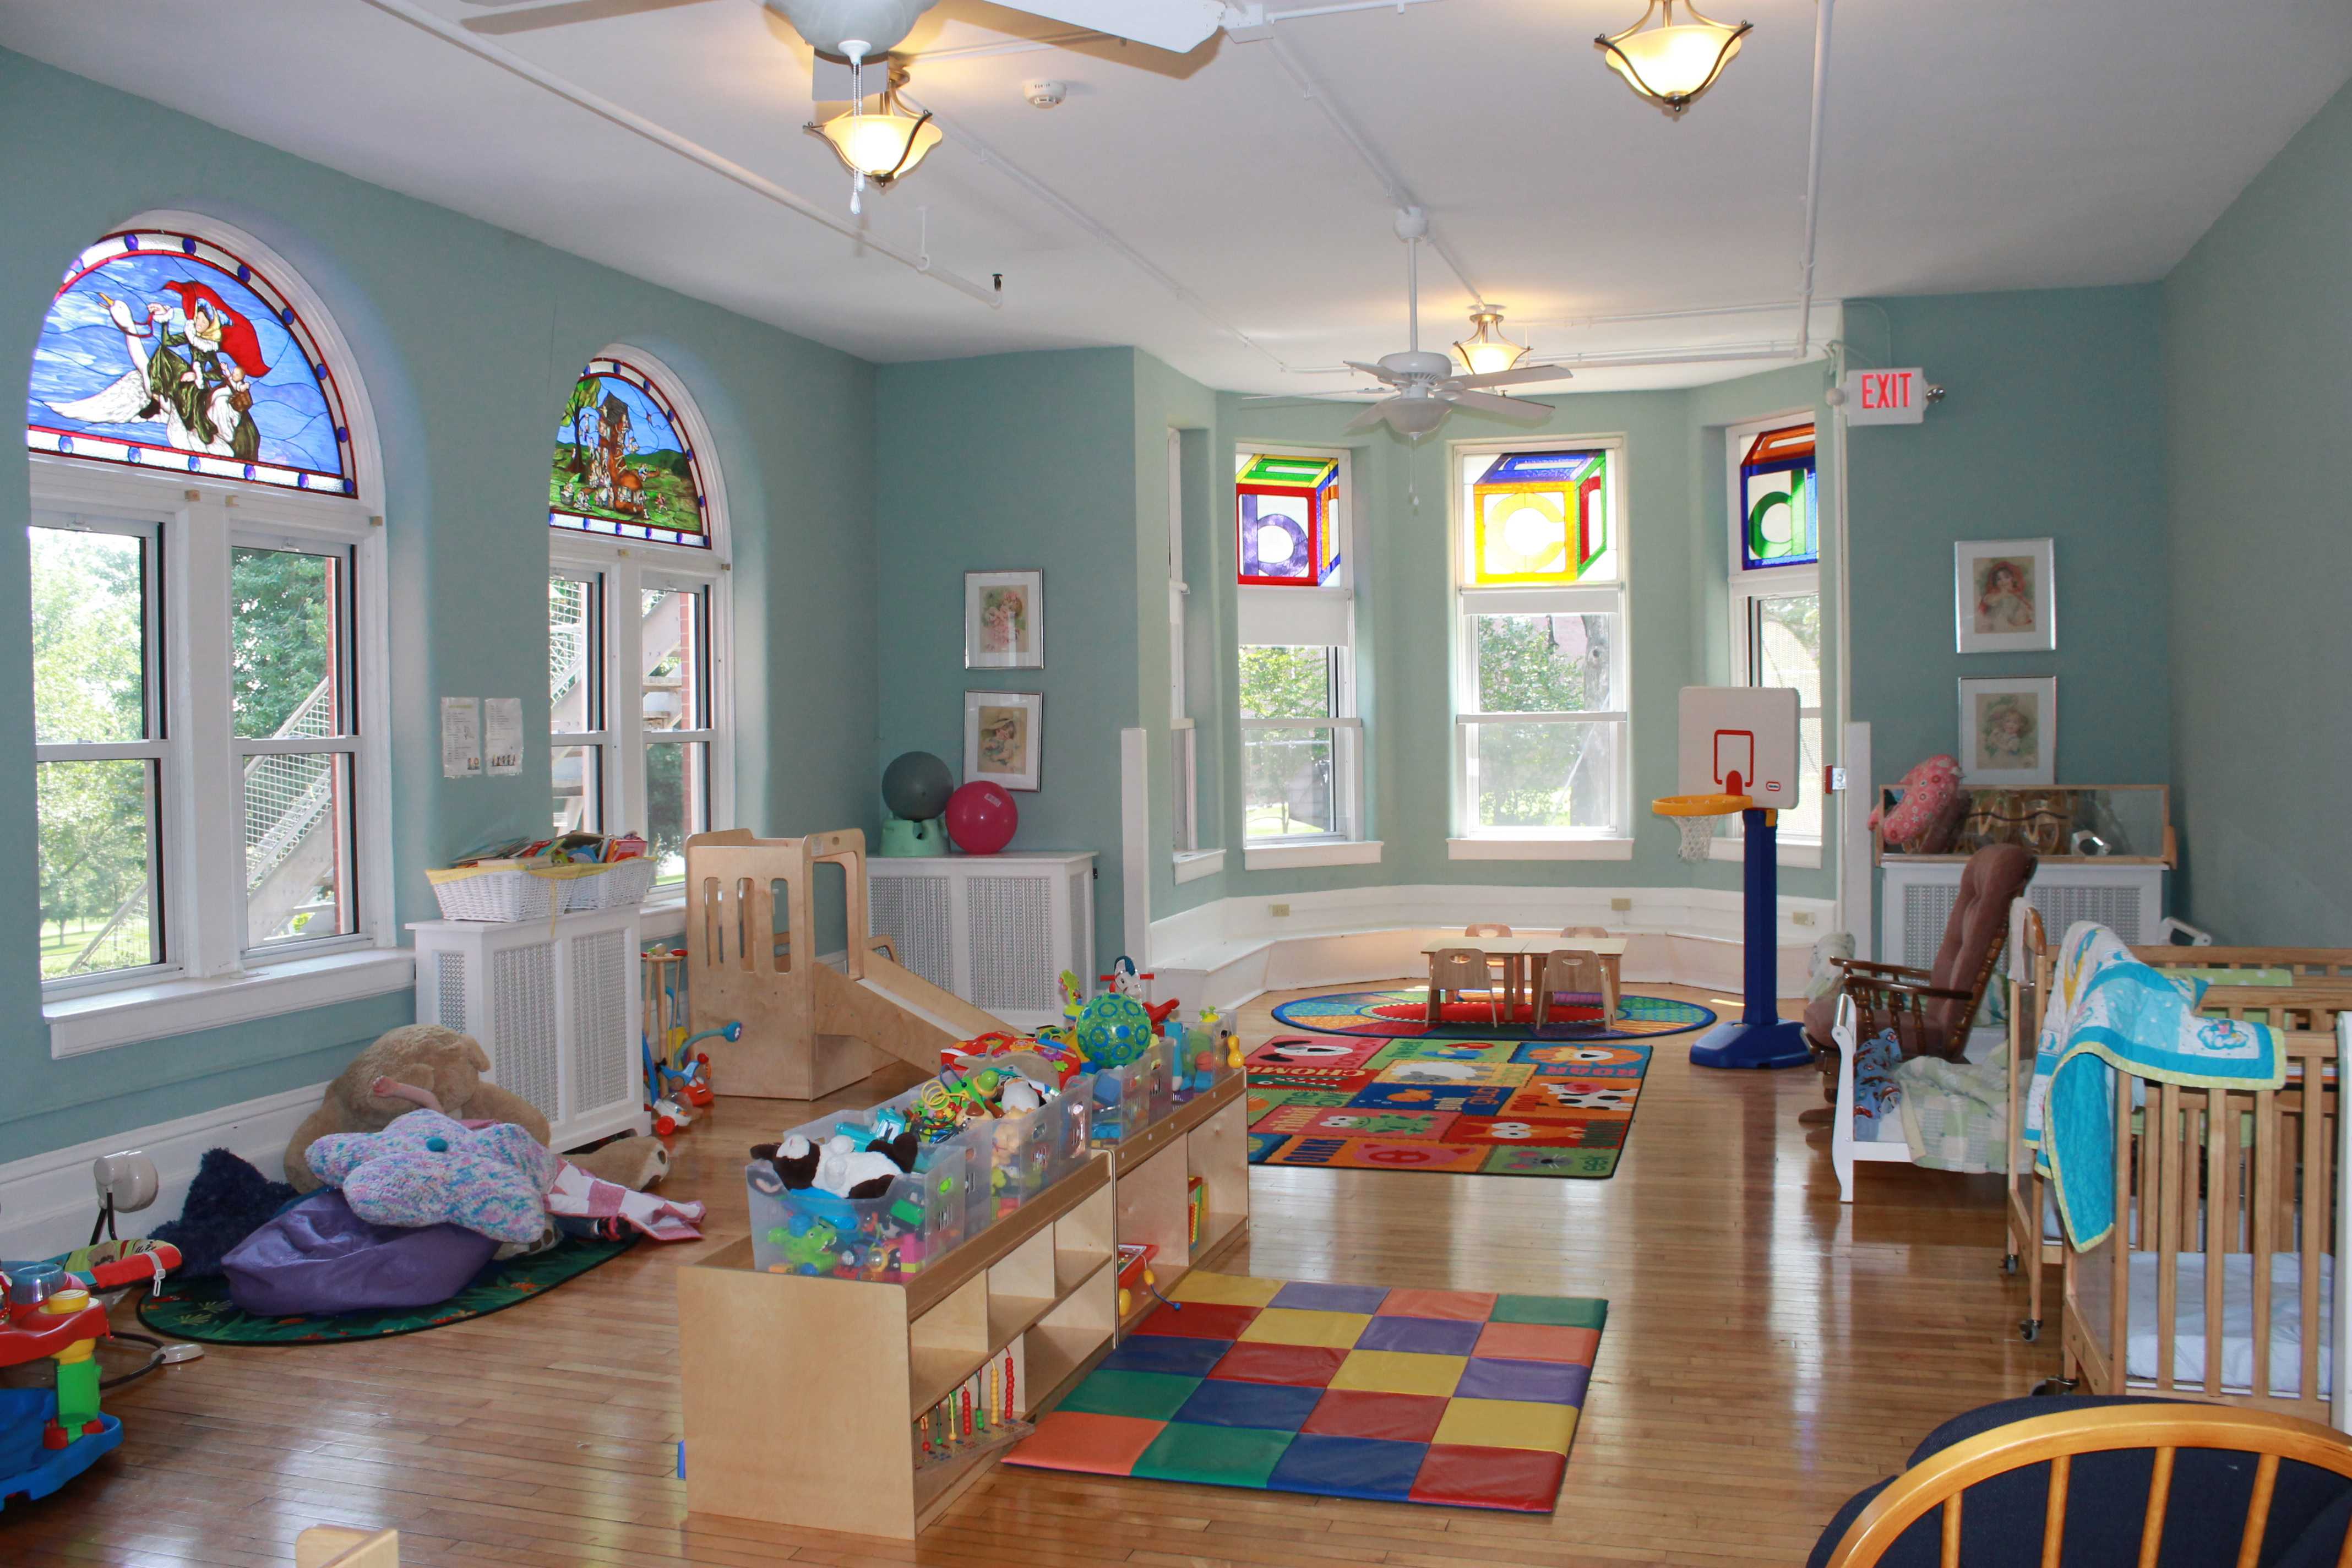 Crisis nursery the noyes home for children for Noyes home